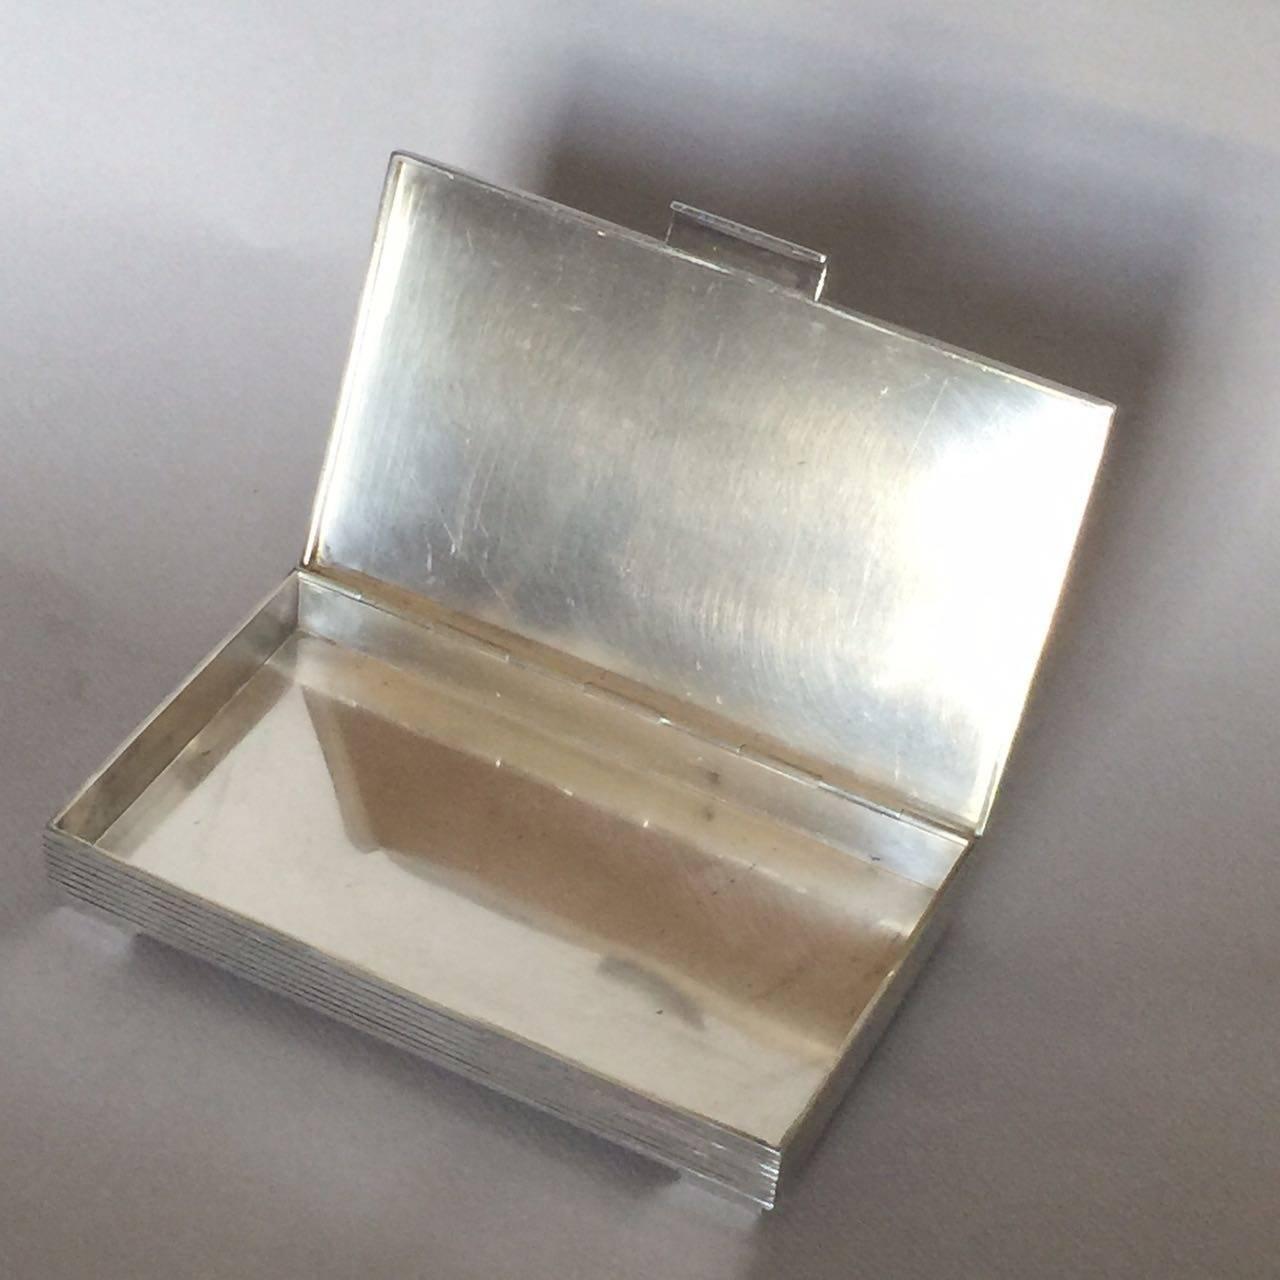 georg jensen sterling silver keepsake box no 712c by sigvard bernadotte at 1stdibs. Black Bedroom Furniture Sets. Home Design Ideas